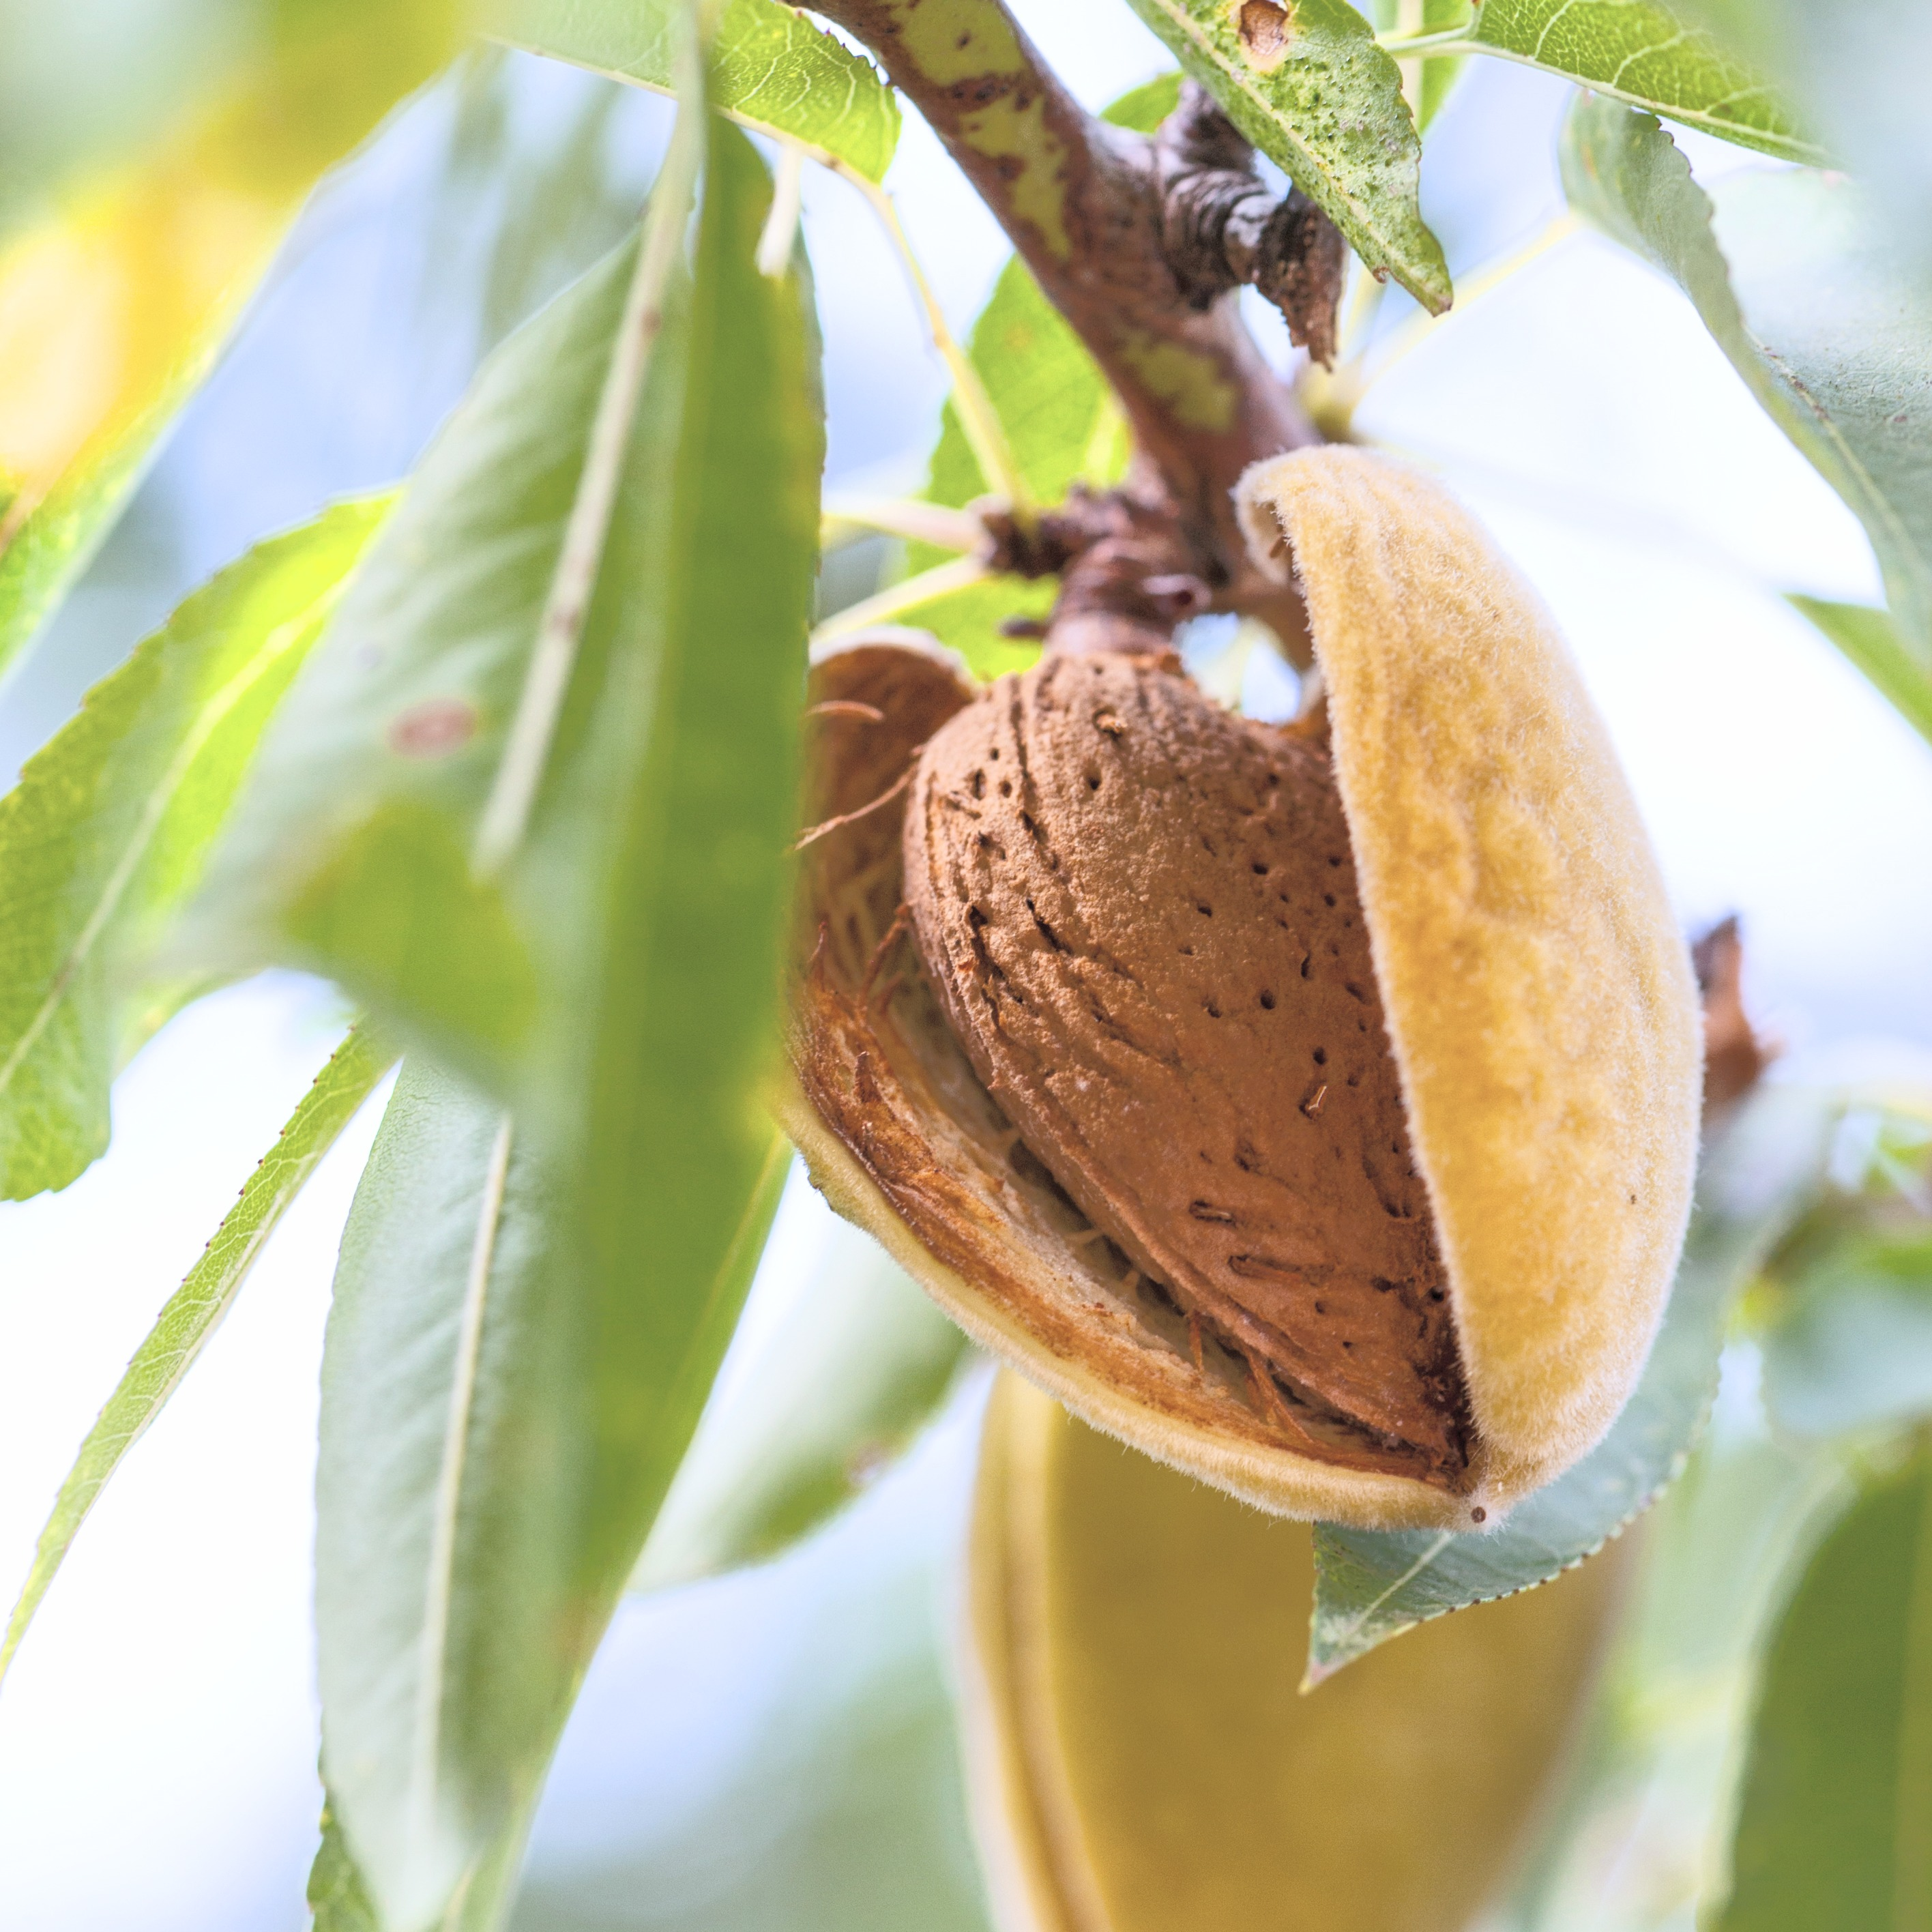 Ripe almonds on the tree branch_edited.j